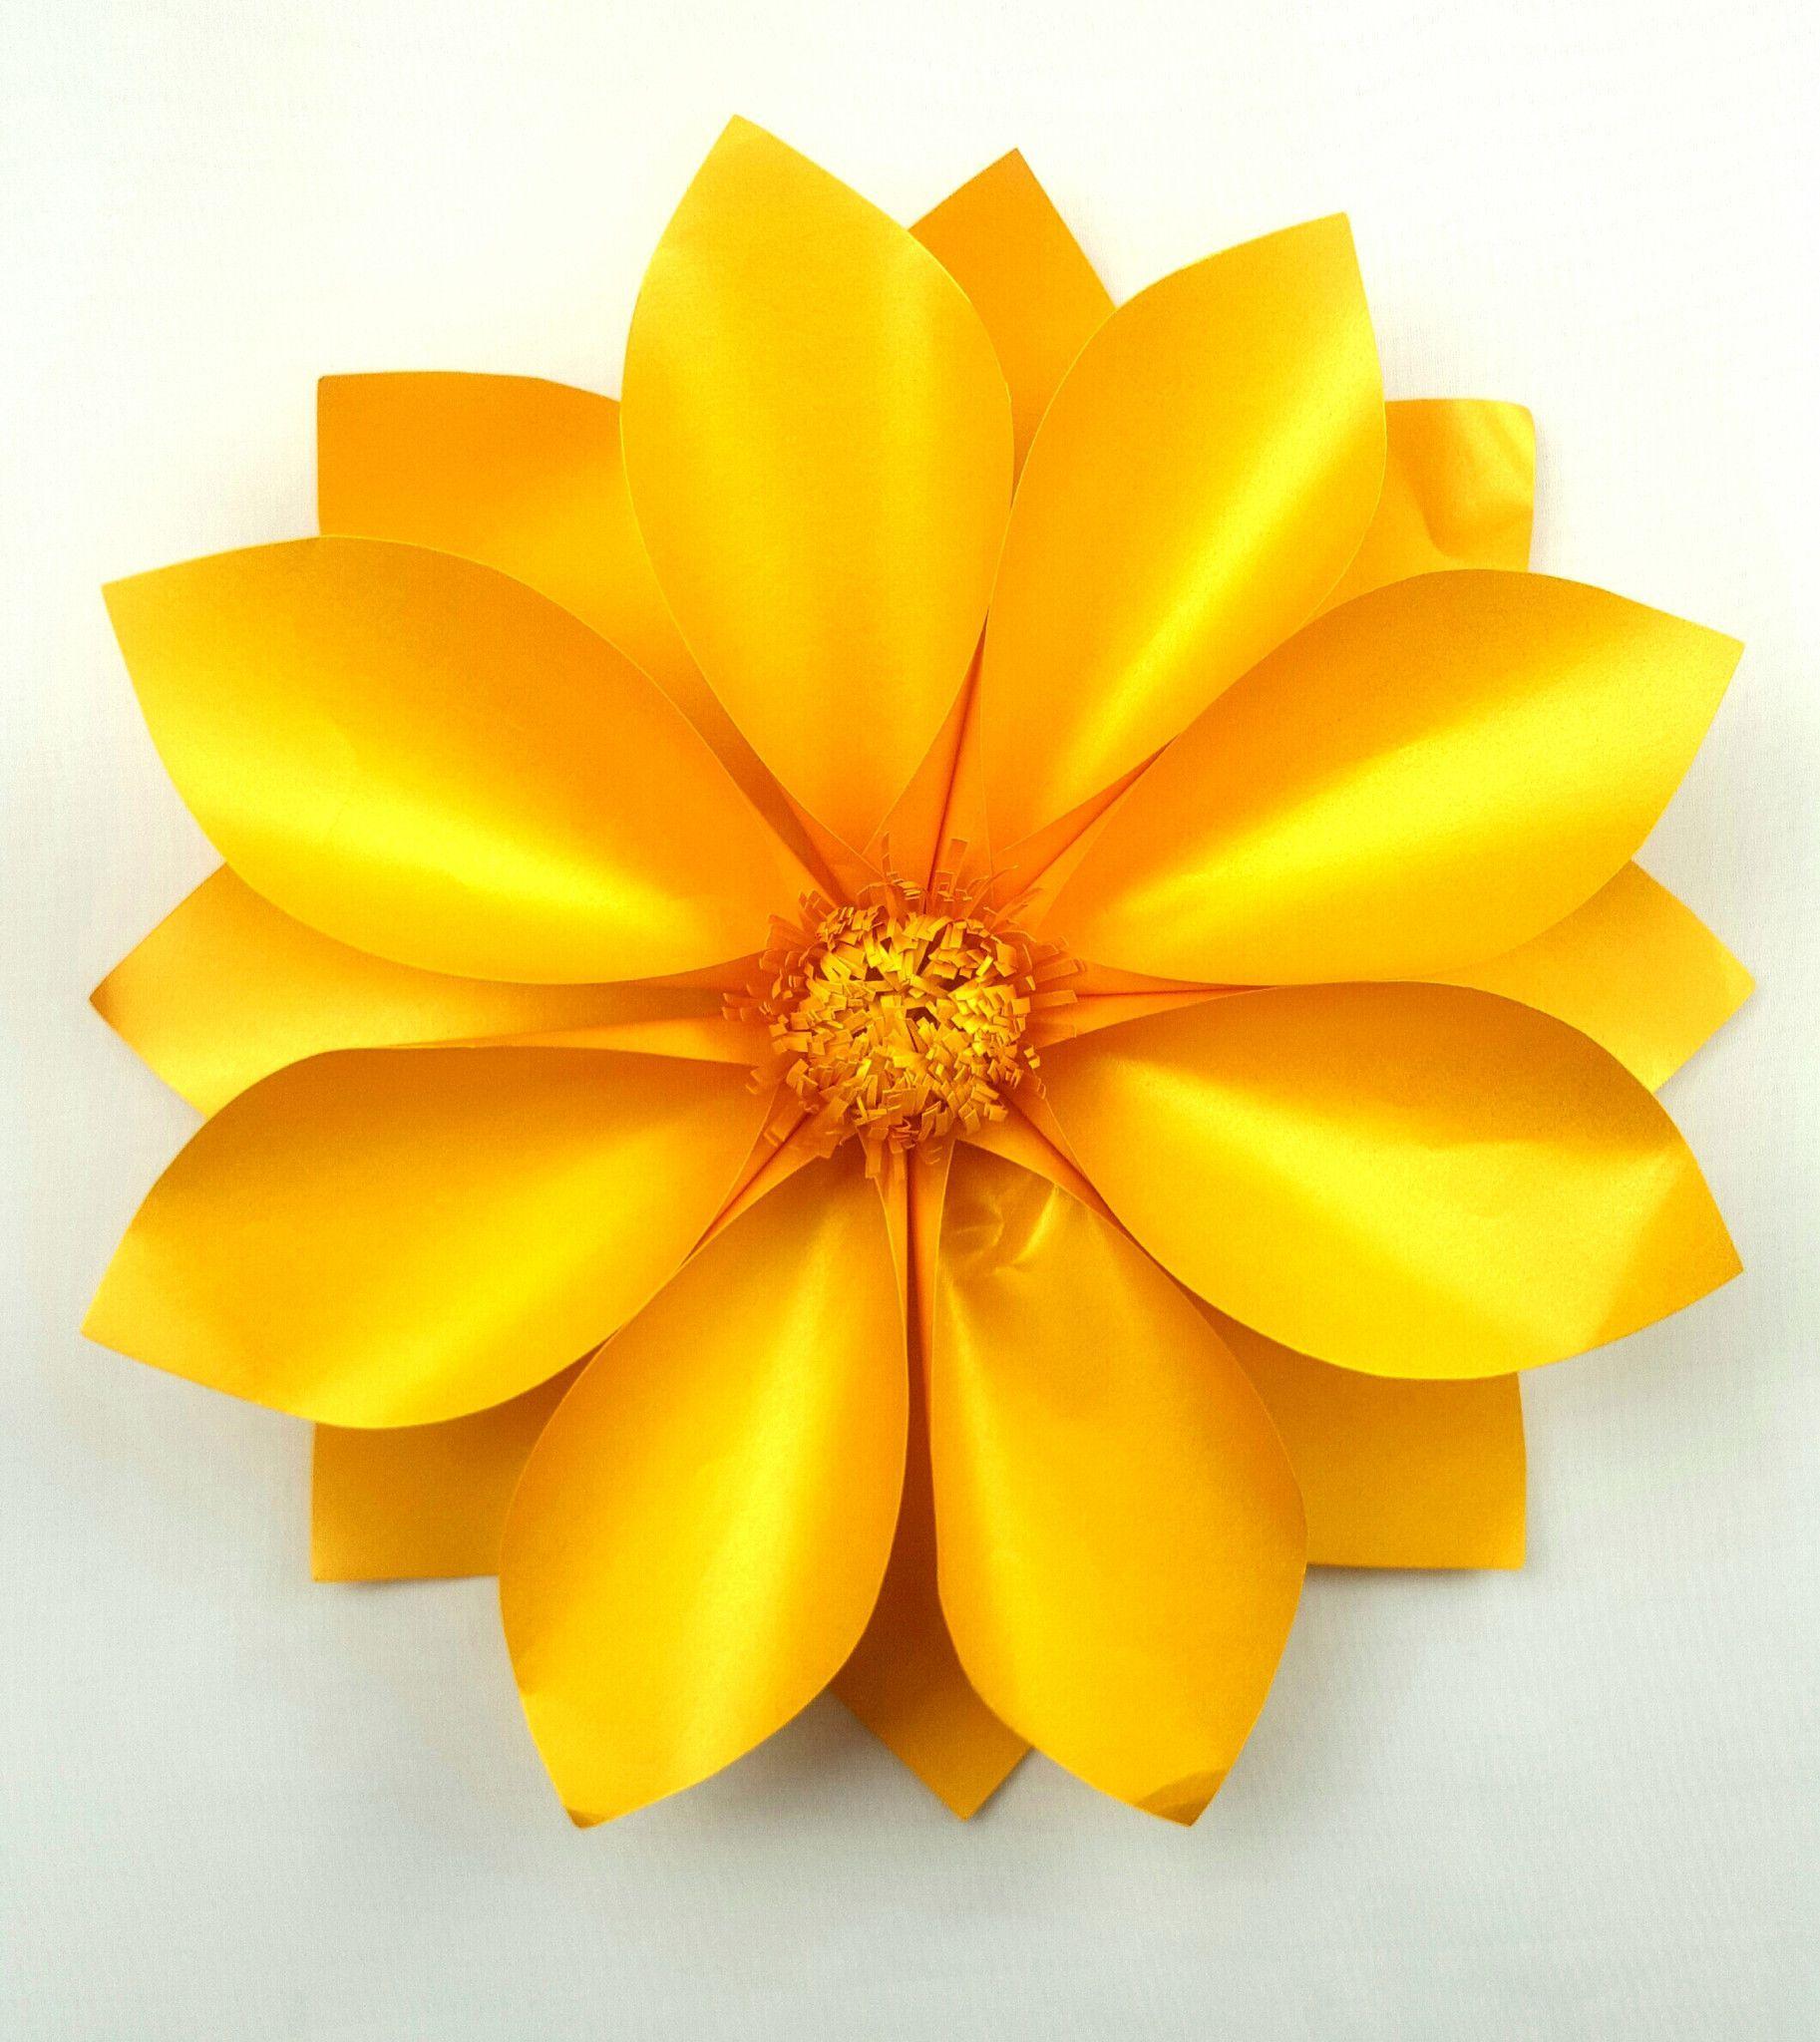 Discounted Handmade Giant Paper Flower 30 Cm Proyectos A Intentar